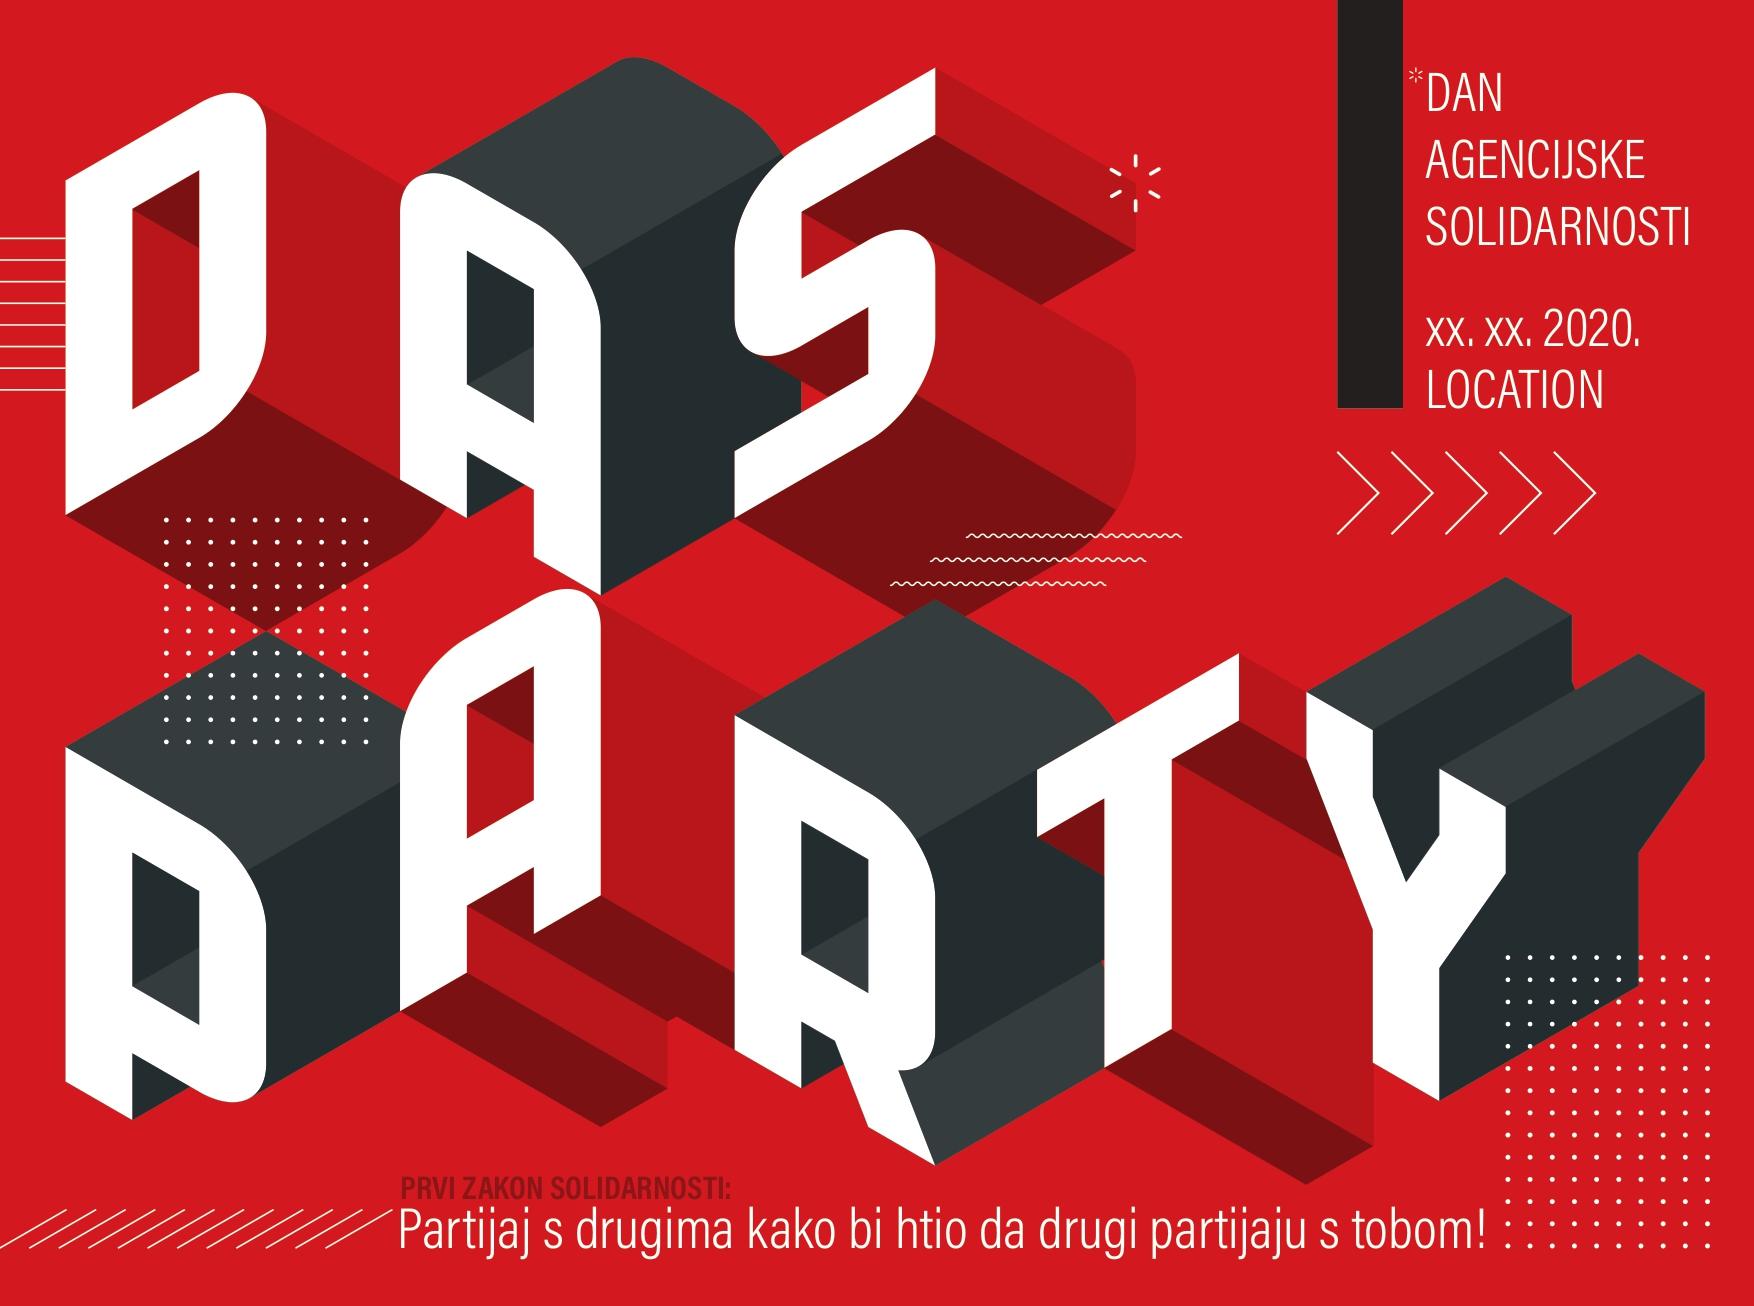 PRVI ZAKON SOLIDARNOSTI Agency: BBDO Zagreb Creative Director: Martina Pavić Designer: Iva Mandić Copywriter: Martina Pavić